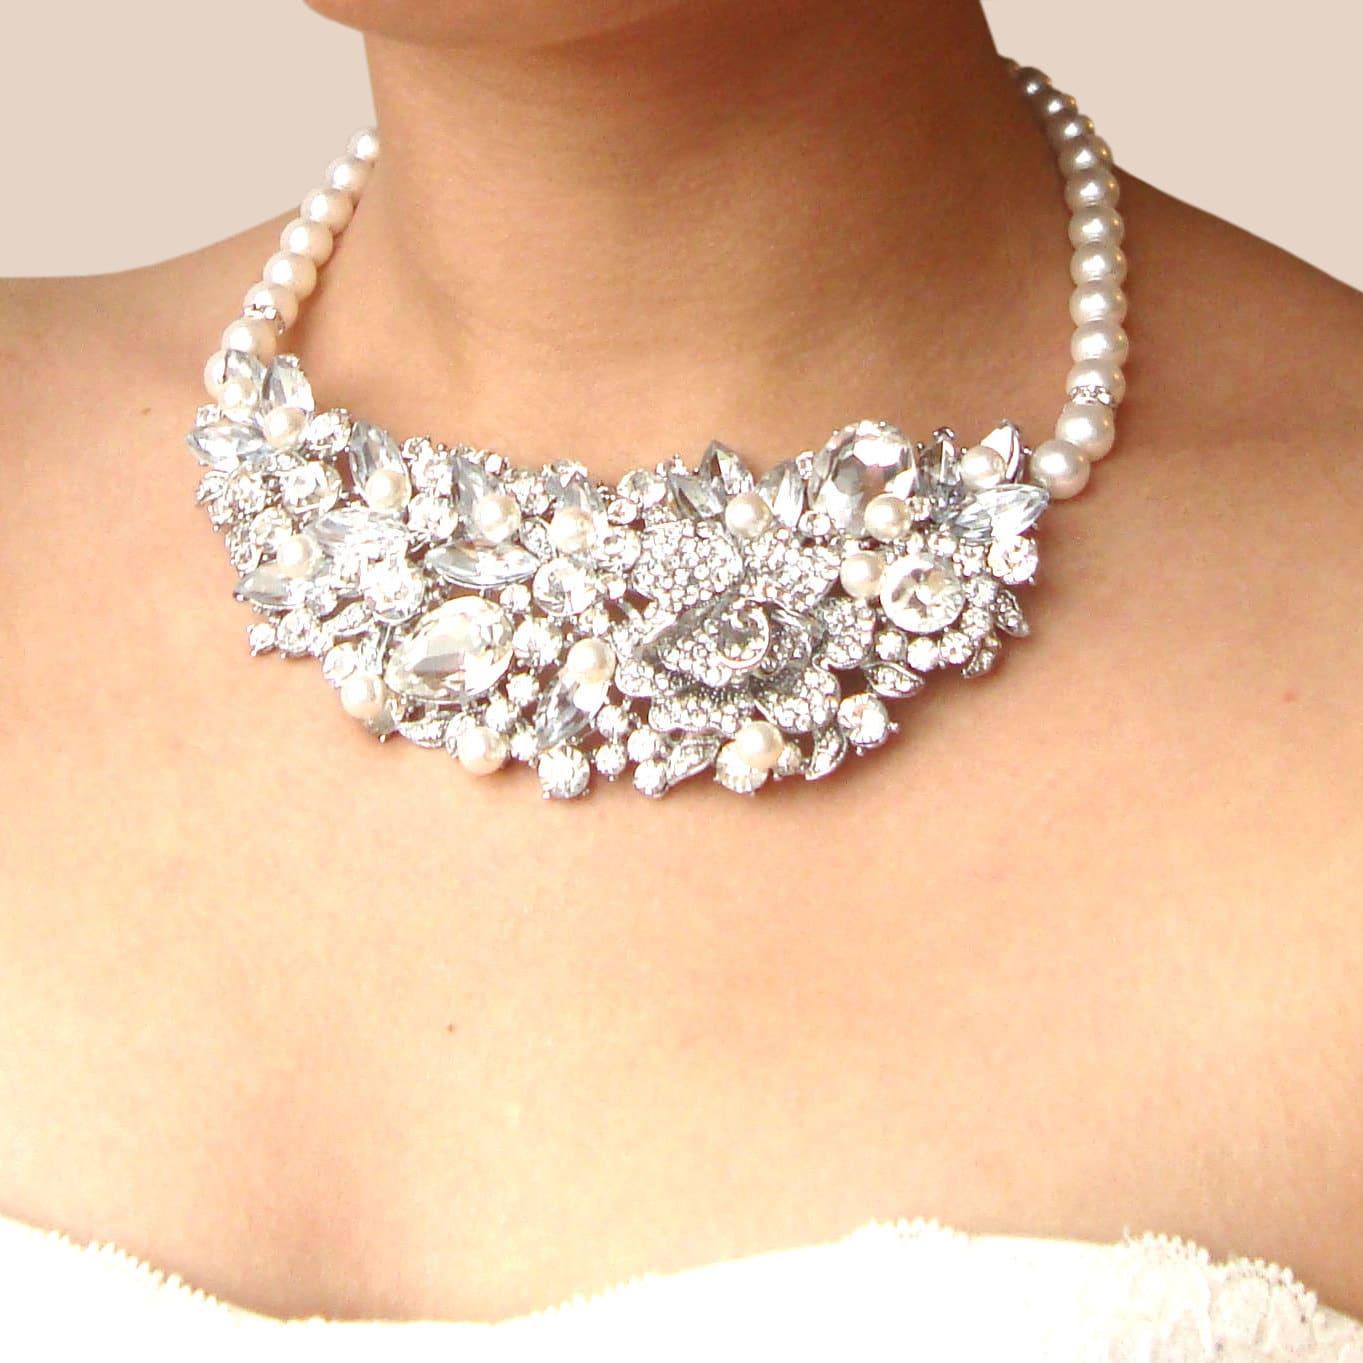 Pearl & Rhinestone Bridal Statement Necklace, Vintage Style Wedding Bridal Necklace, Bib Collar Necklace, Rhinestone Bridal Wedding Jewelry